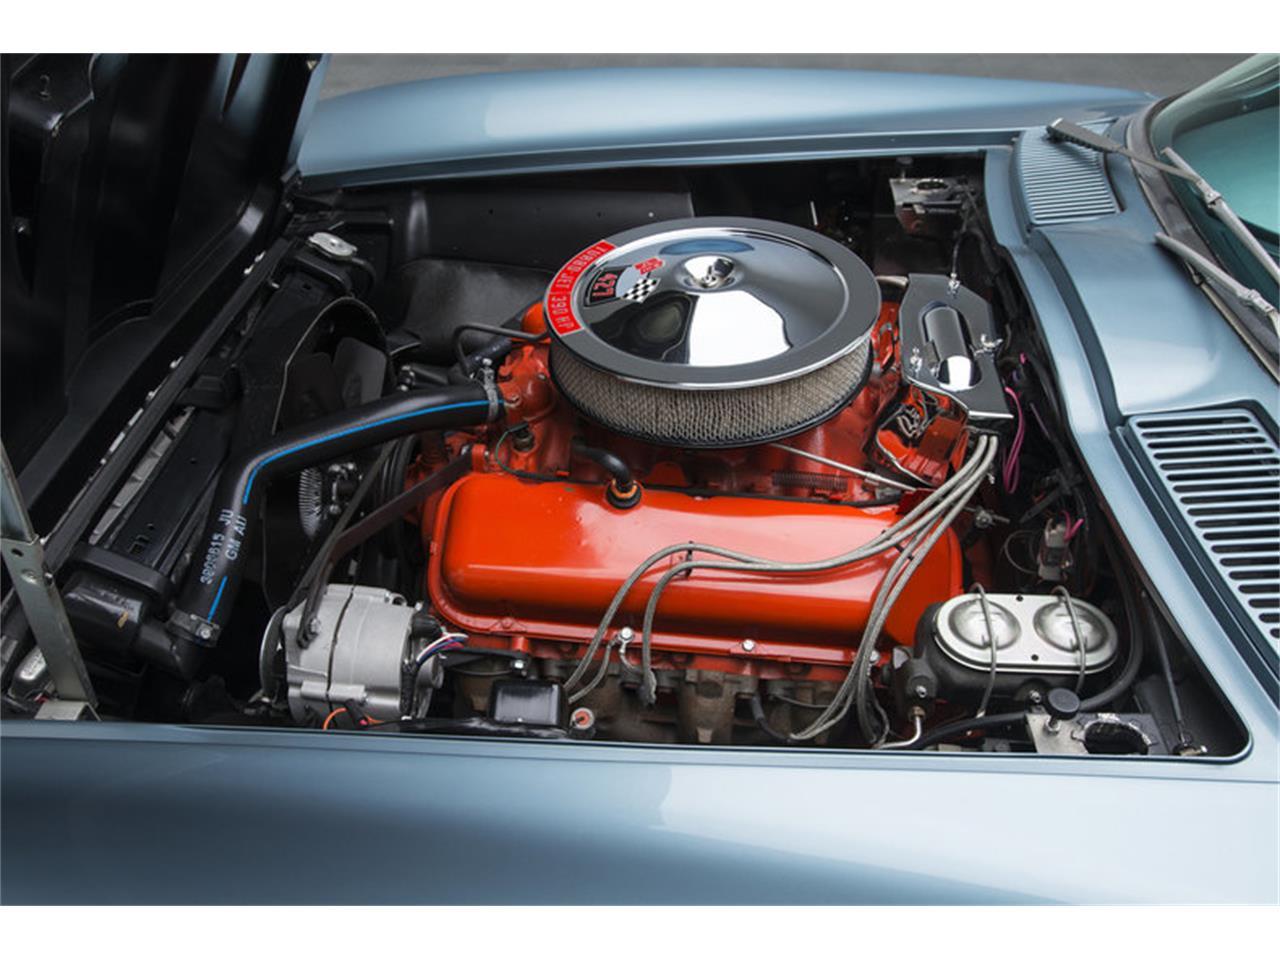 Large Picture of '67 Corvette located in North Carolina - MESF